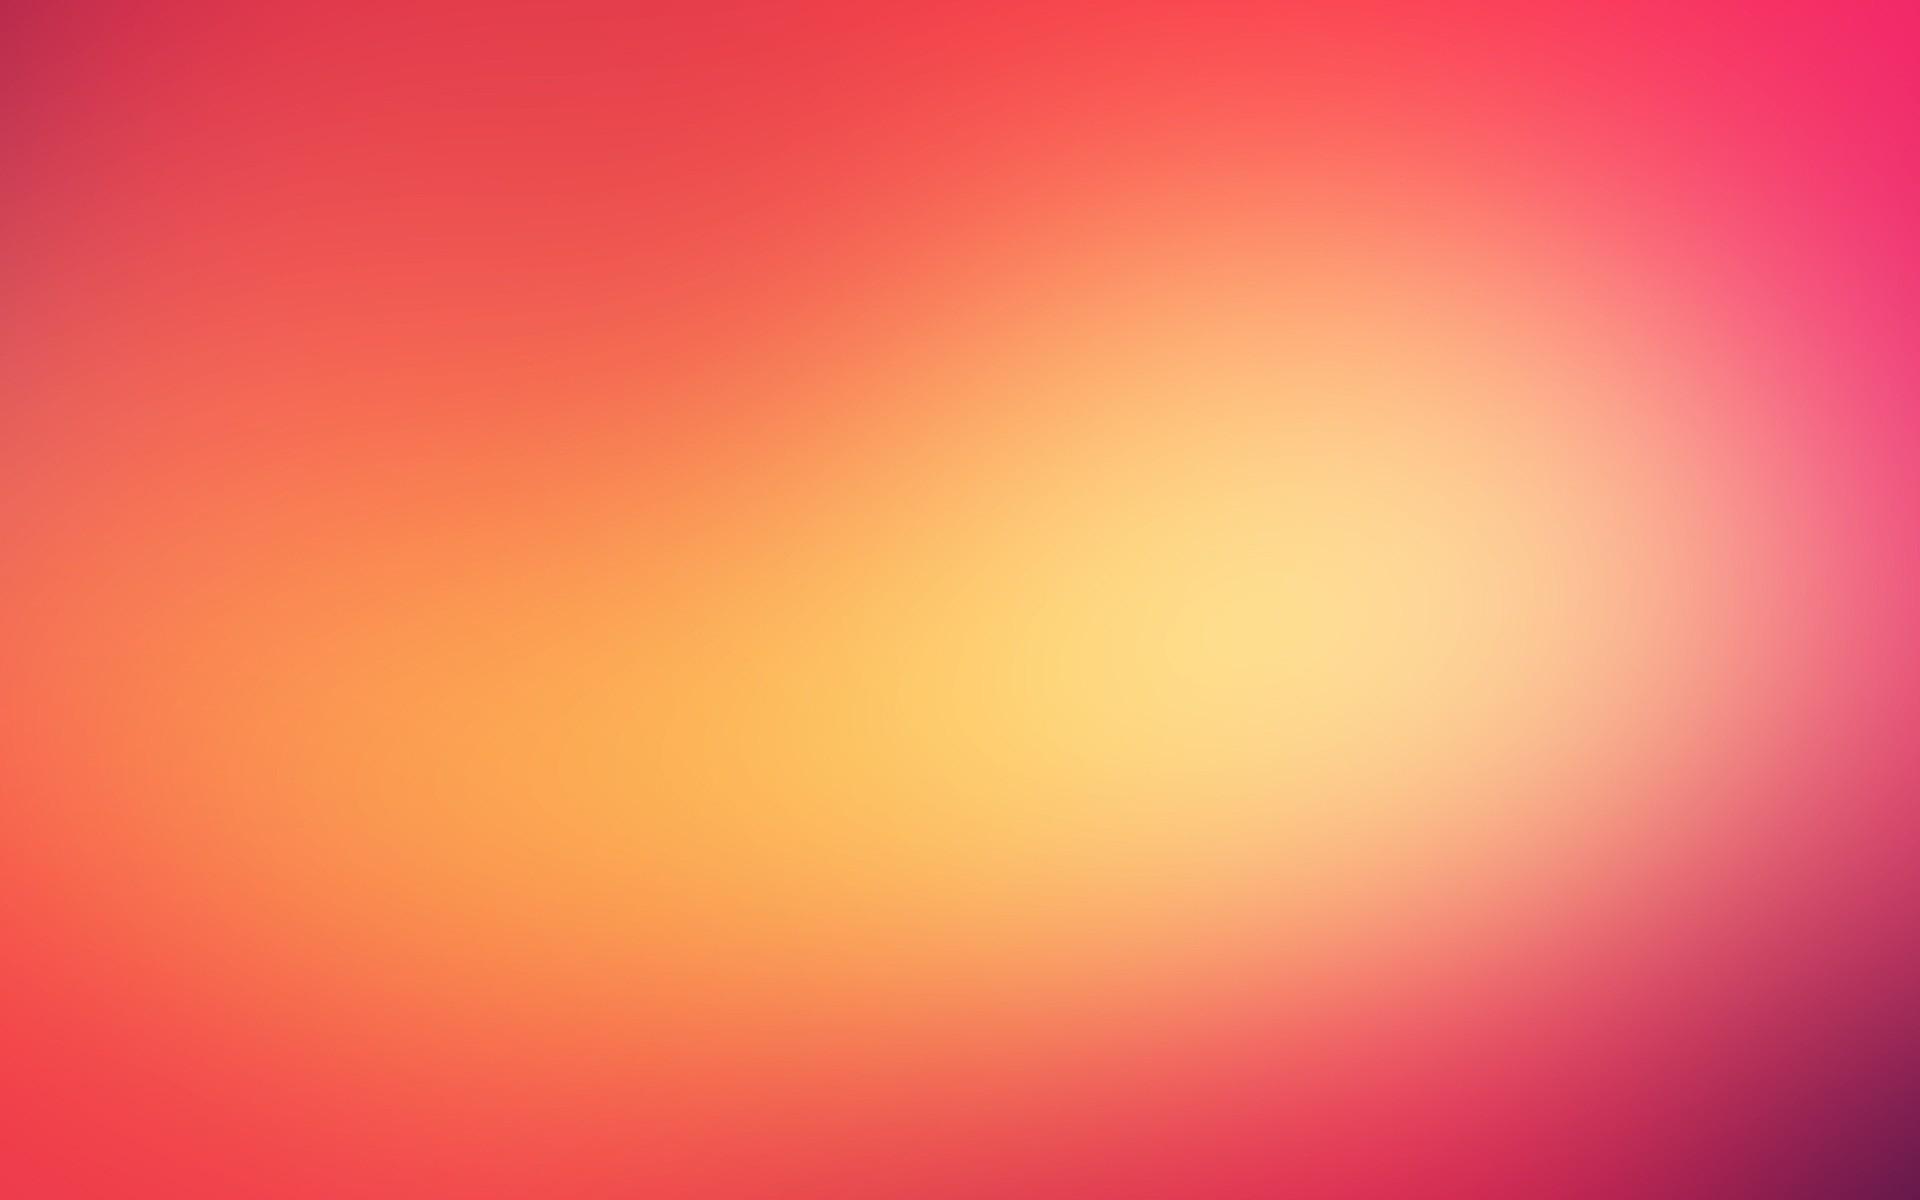 warm colors 34538